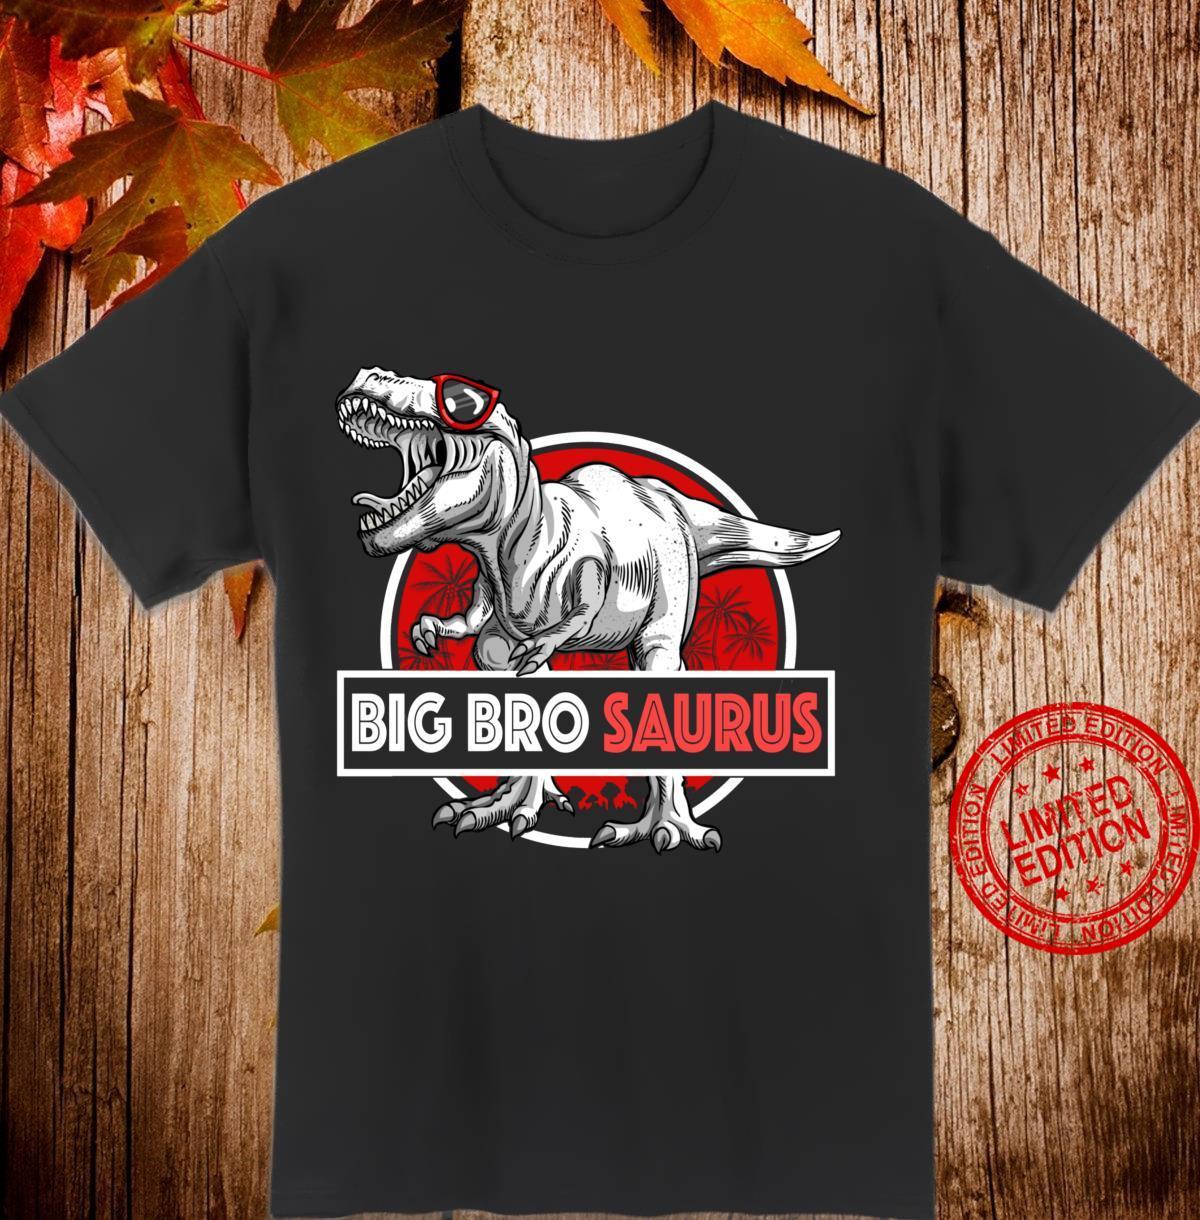 Big Brosaurus TRex Shirt Lustig Big Bro Saurus Dinosaurier Langarmshirt Shirt